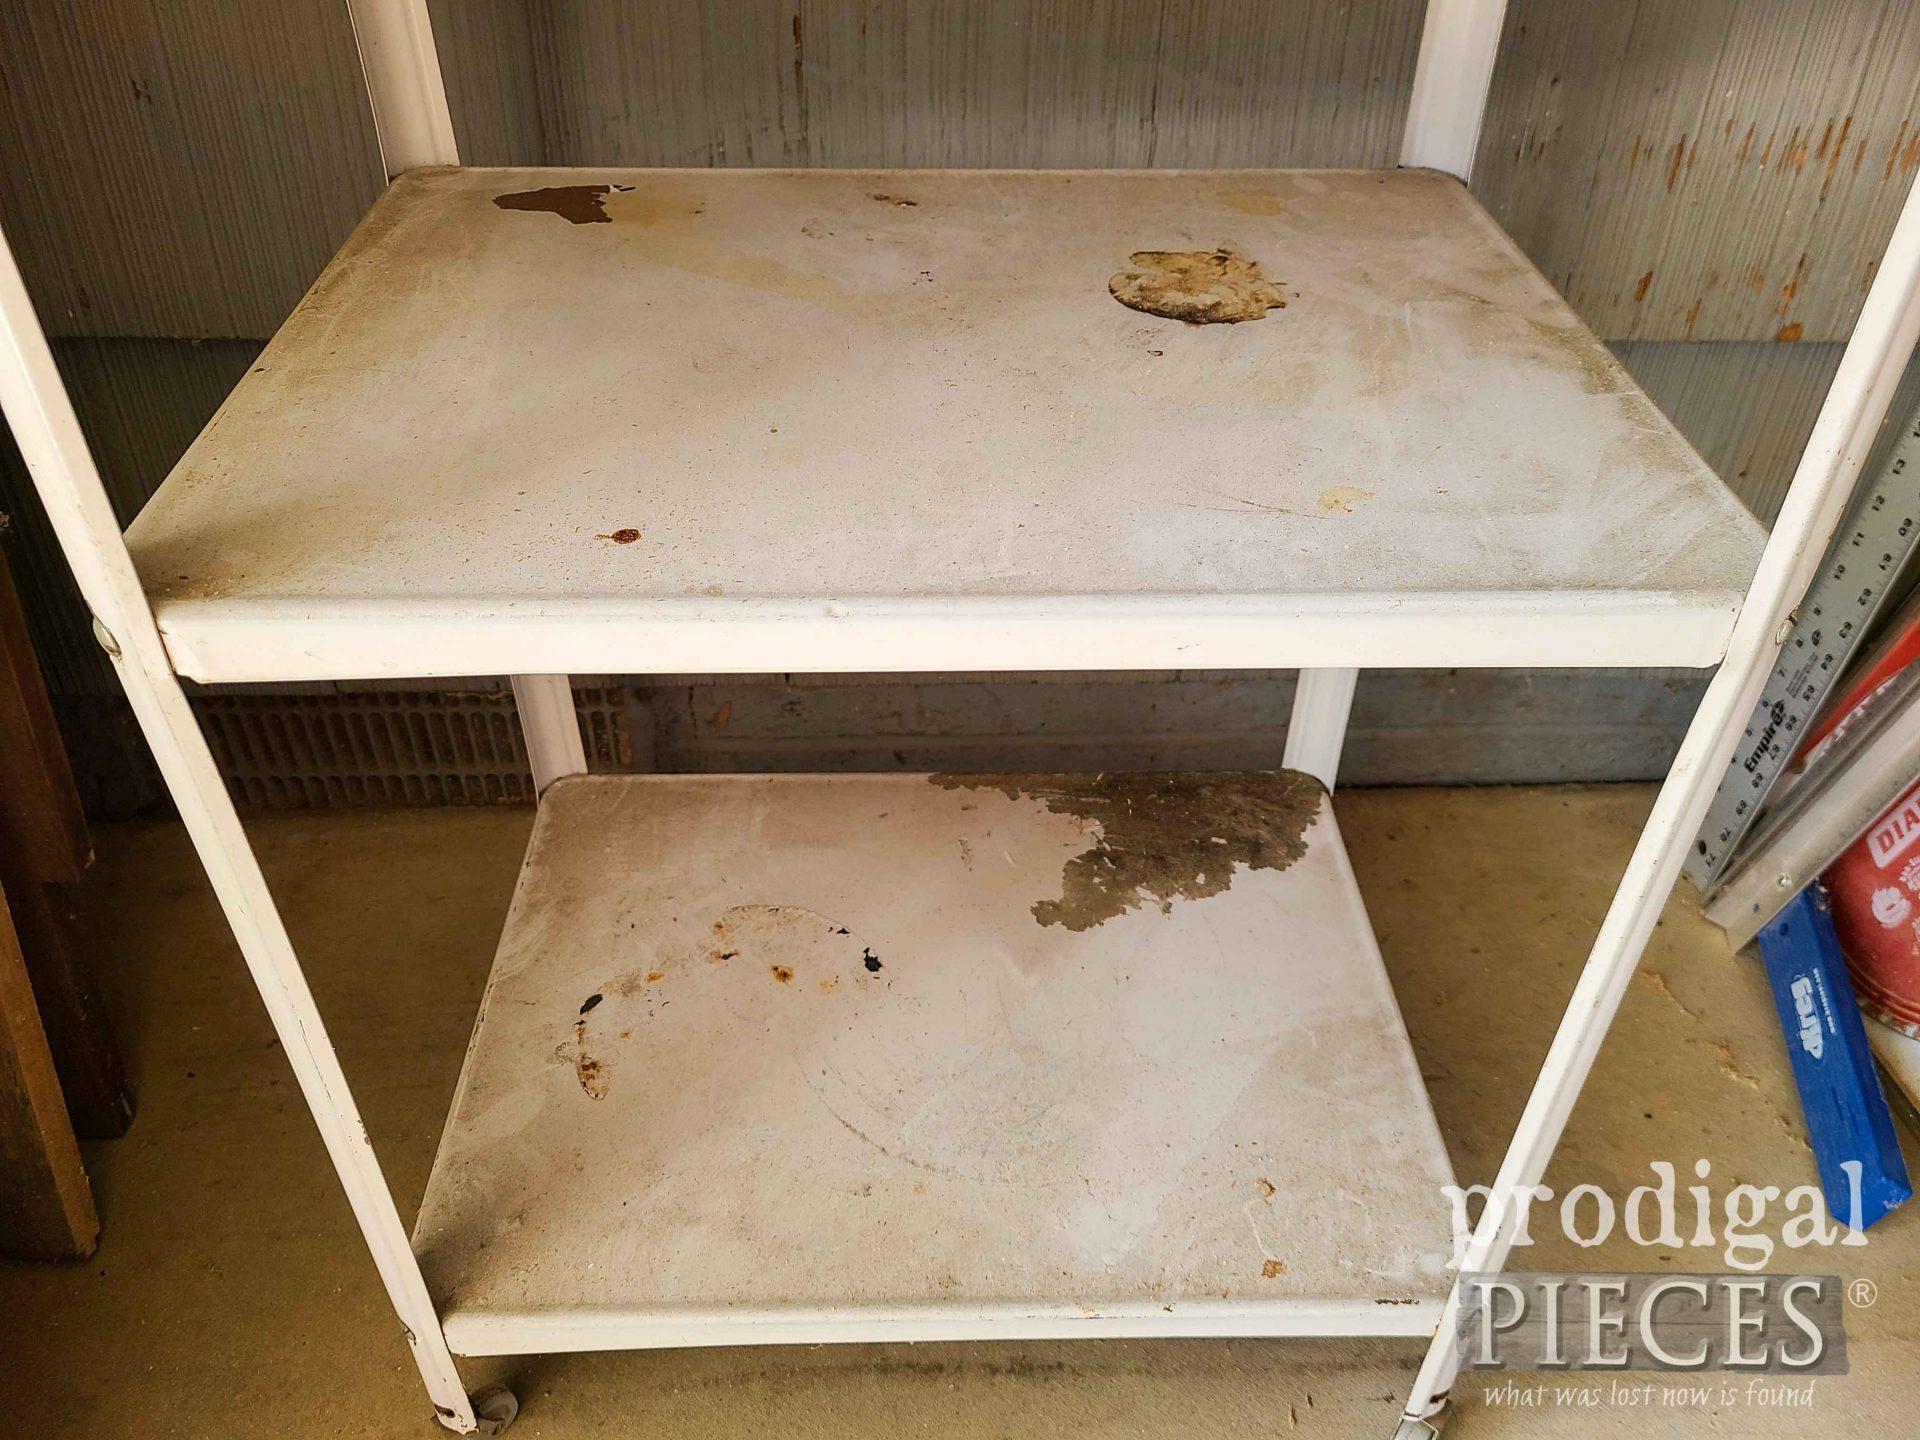 Damaged Vintage Serving Cart Bottom | prodigalpieces.com